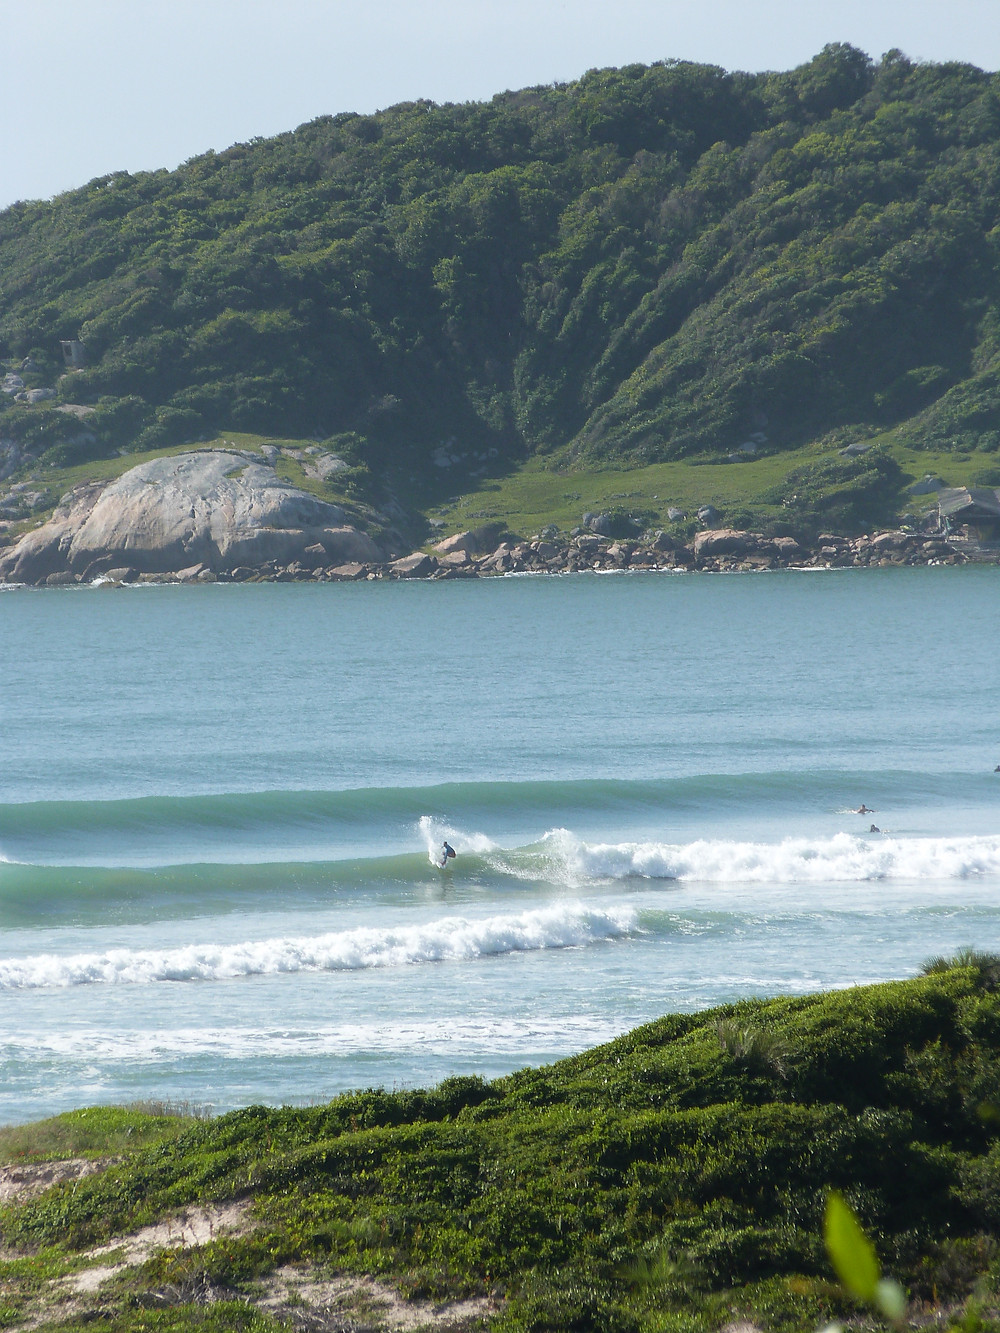 Surfer in praia do Rosa Brazil